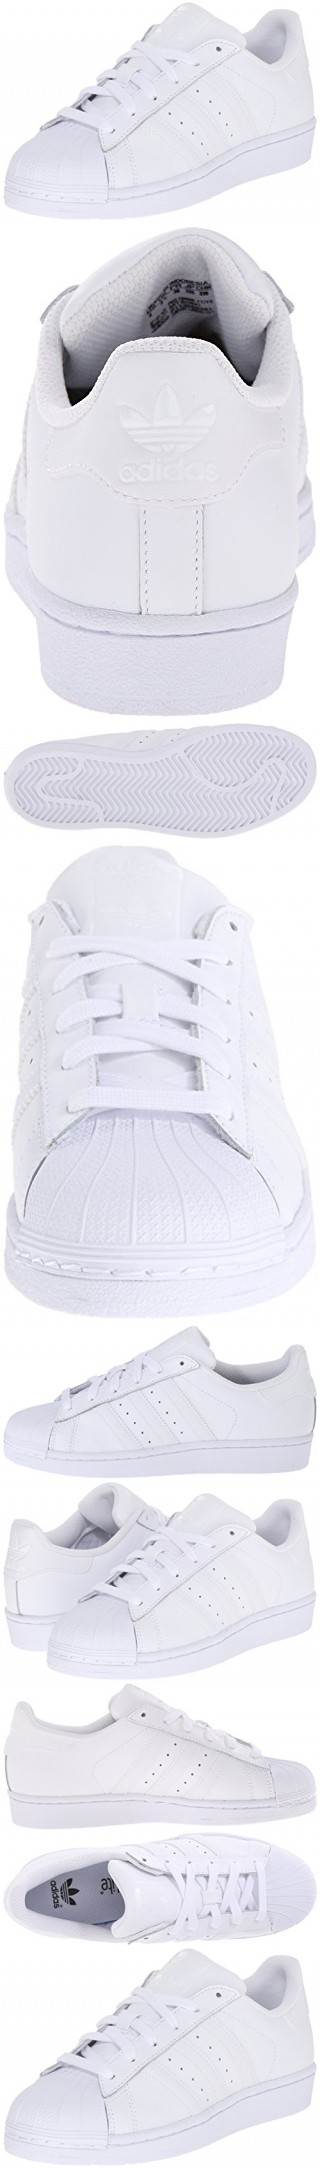 Adidas Originals Superstar Foundation J Casual Basketball-Inspired Low-Cut  Sneaker (Big Kid) 1f409ae0c5209